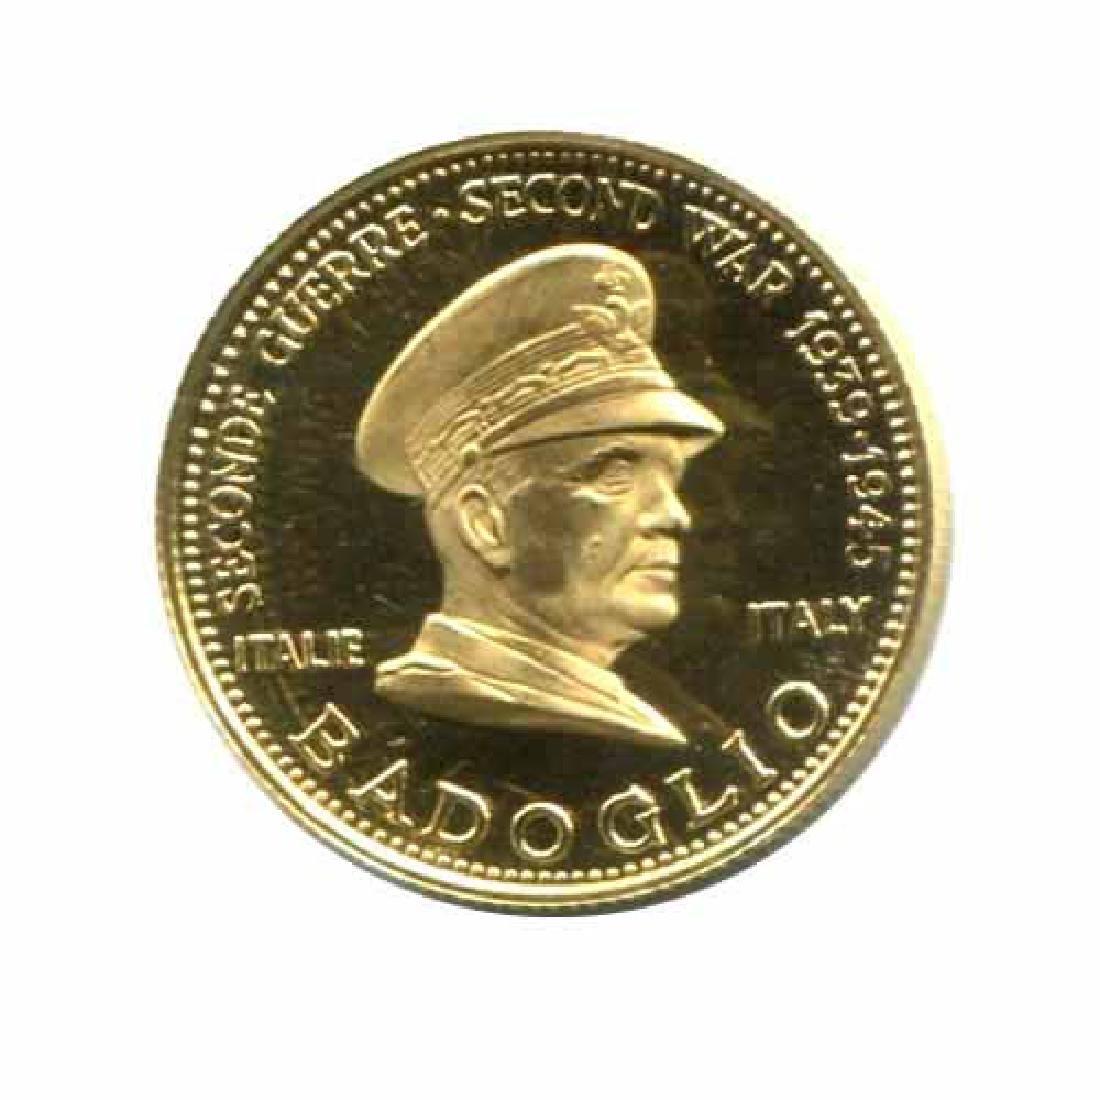 WWII Commemorative Proof Gold Medal 7g. 1958 Badoglio